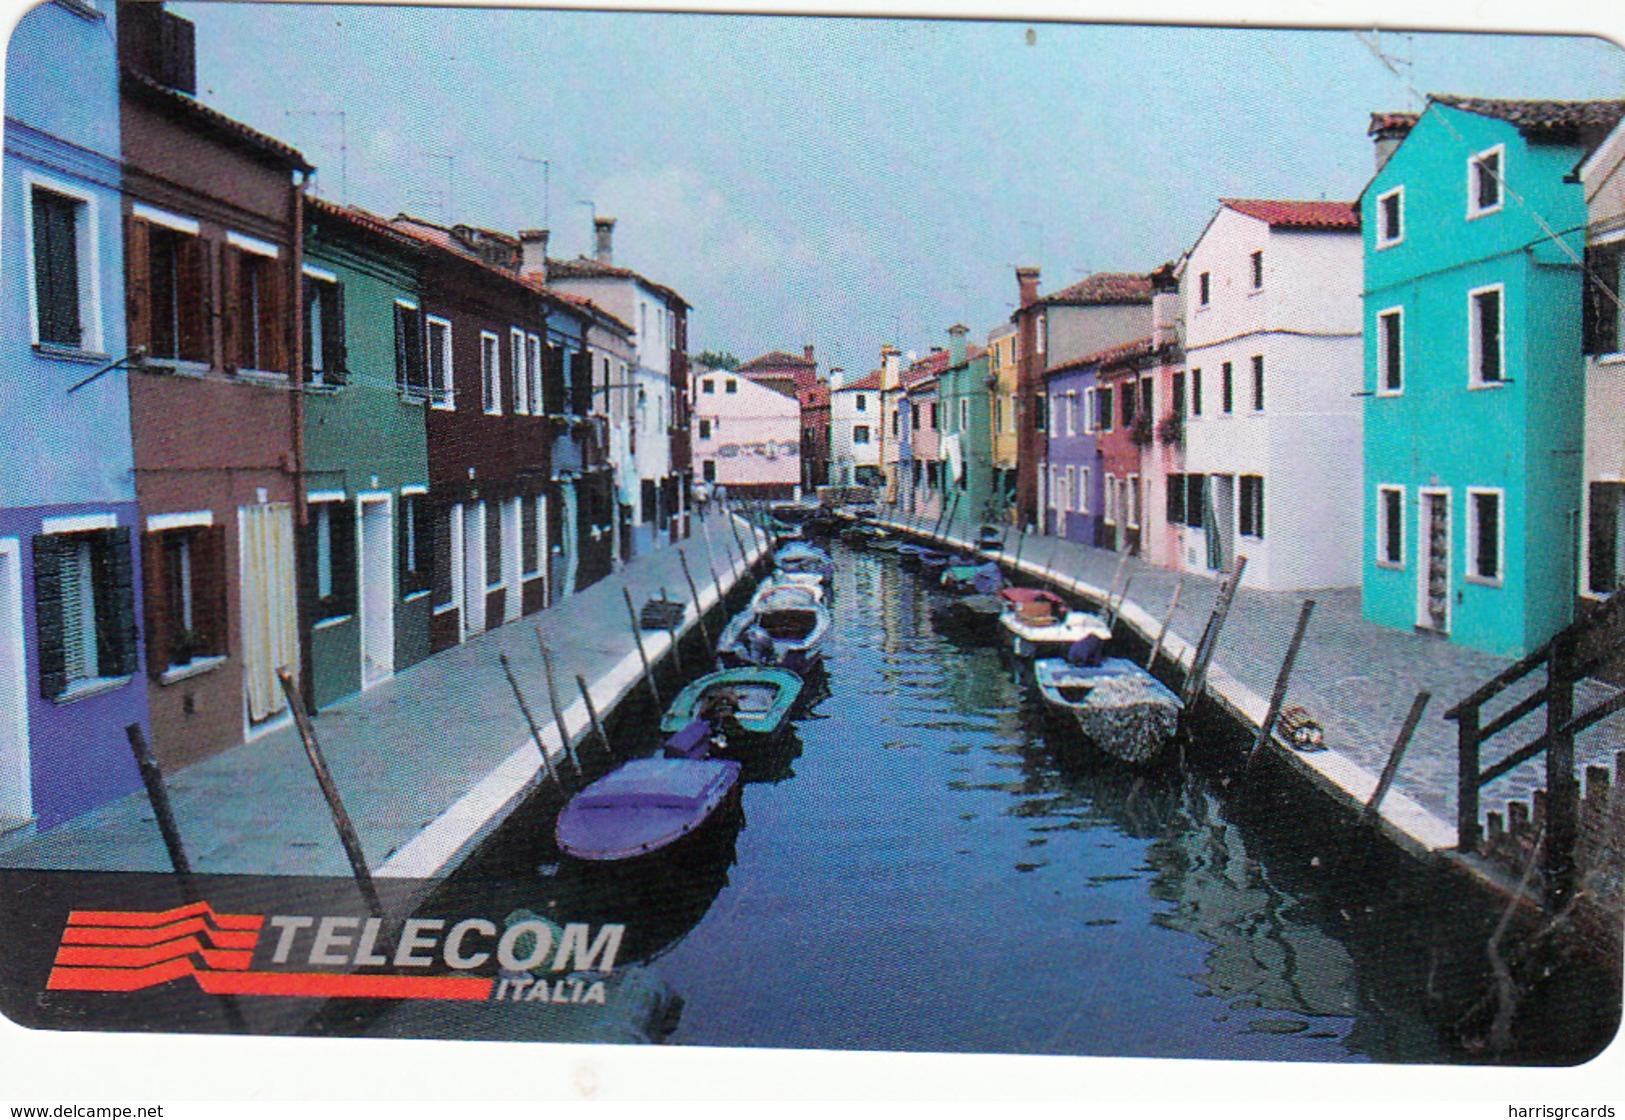 ITALY - Linee D'Italia , Veneto, Venezia,  12/99, 10.000 Lire,mint - Italia